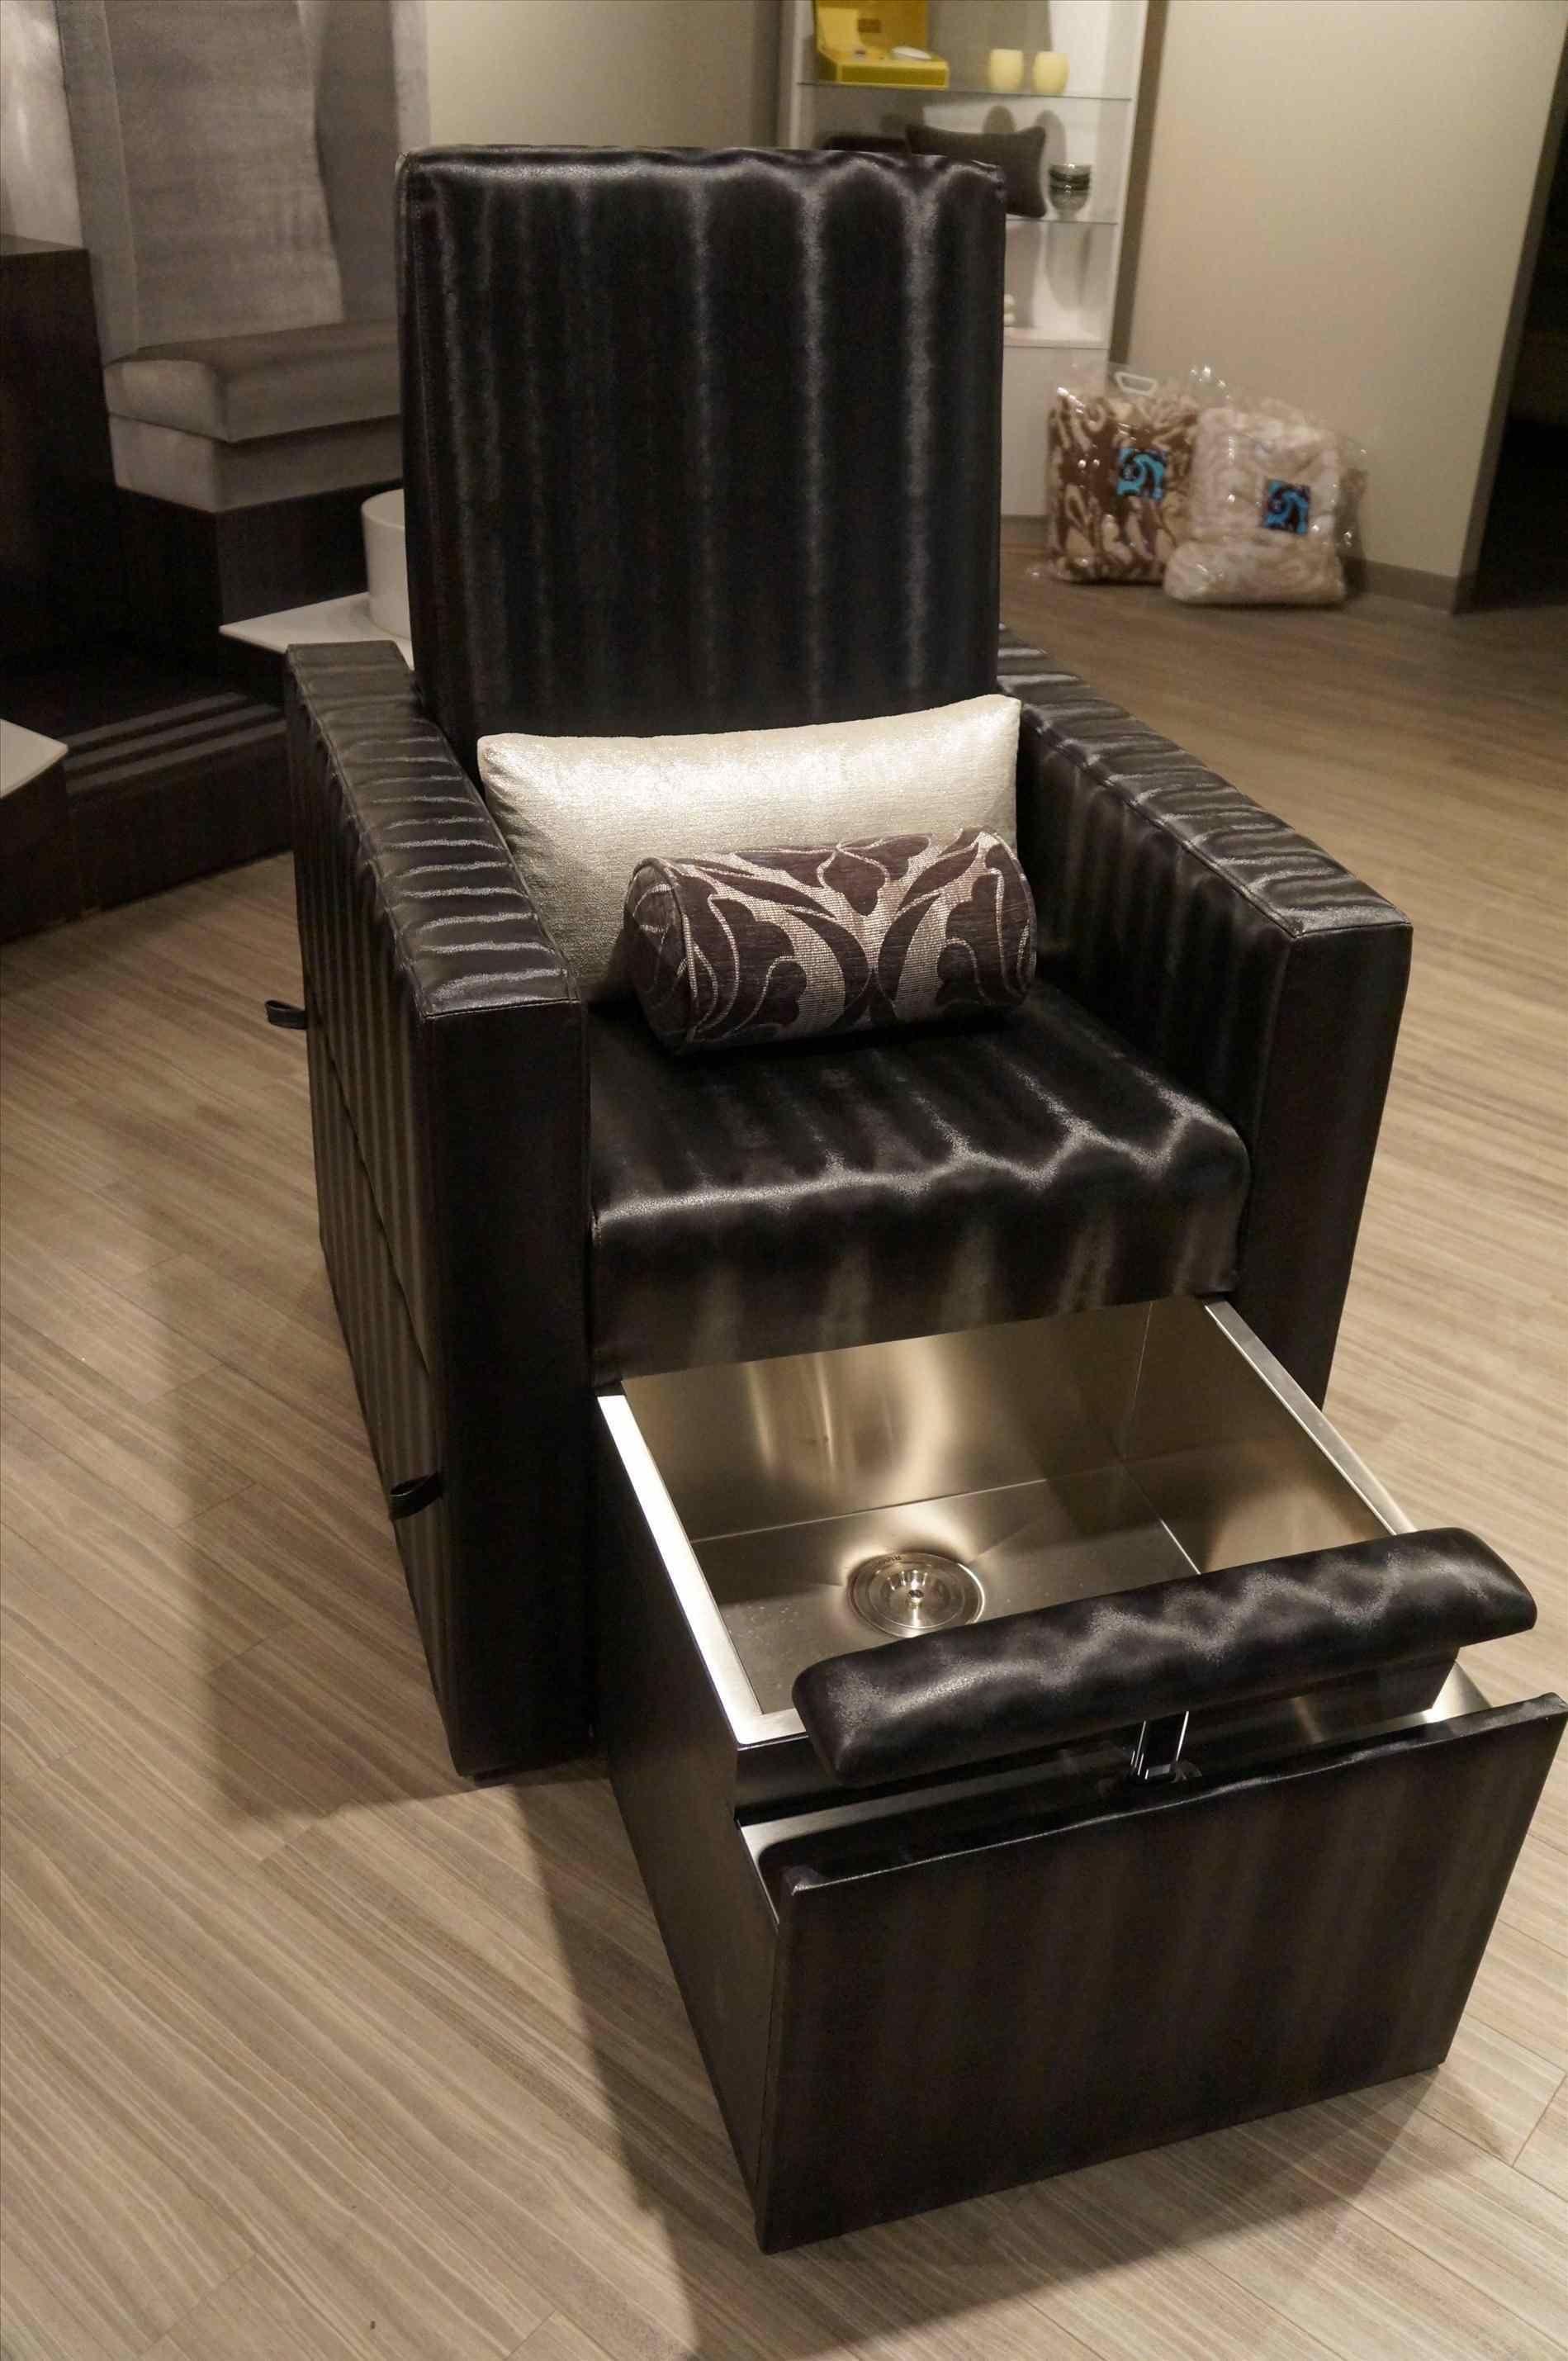 cheap pedicure chairs ergonomic chair top 10 for sale pinterest